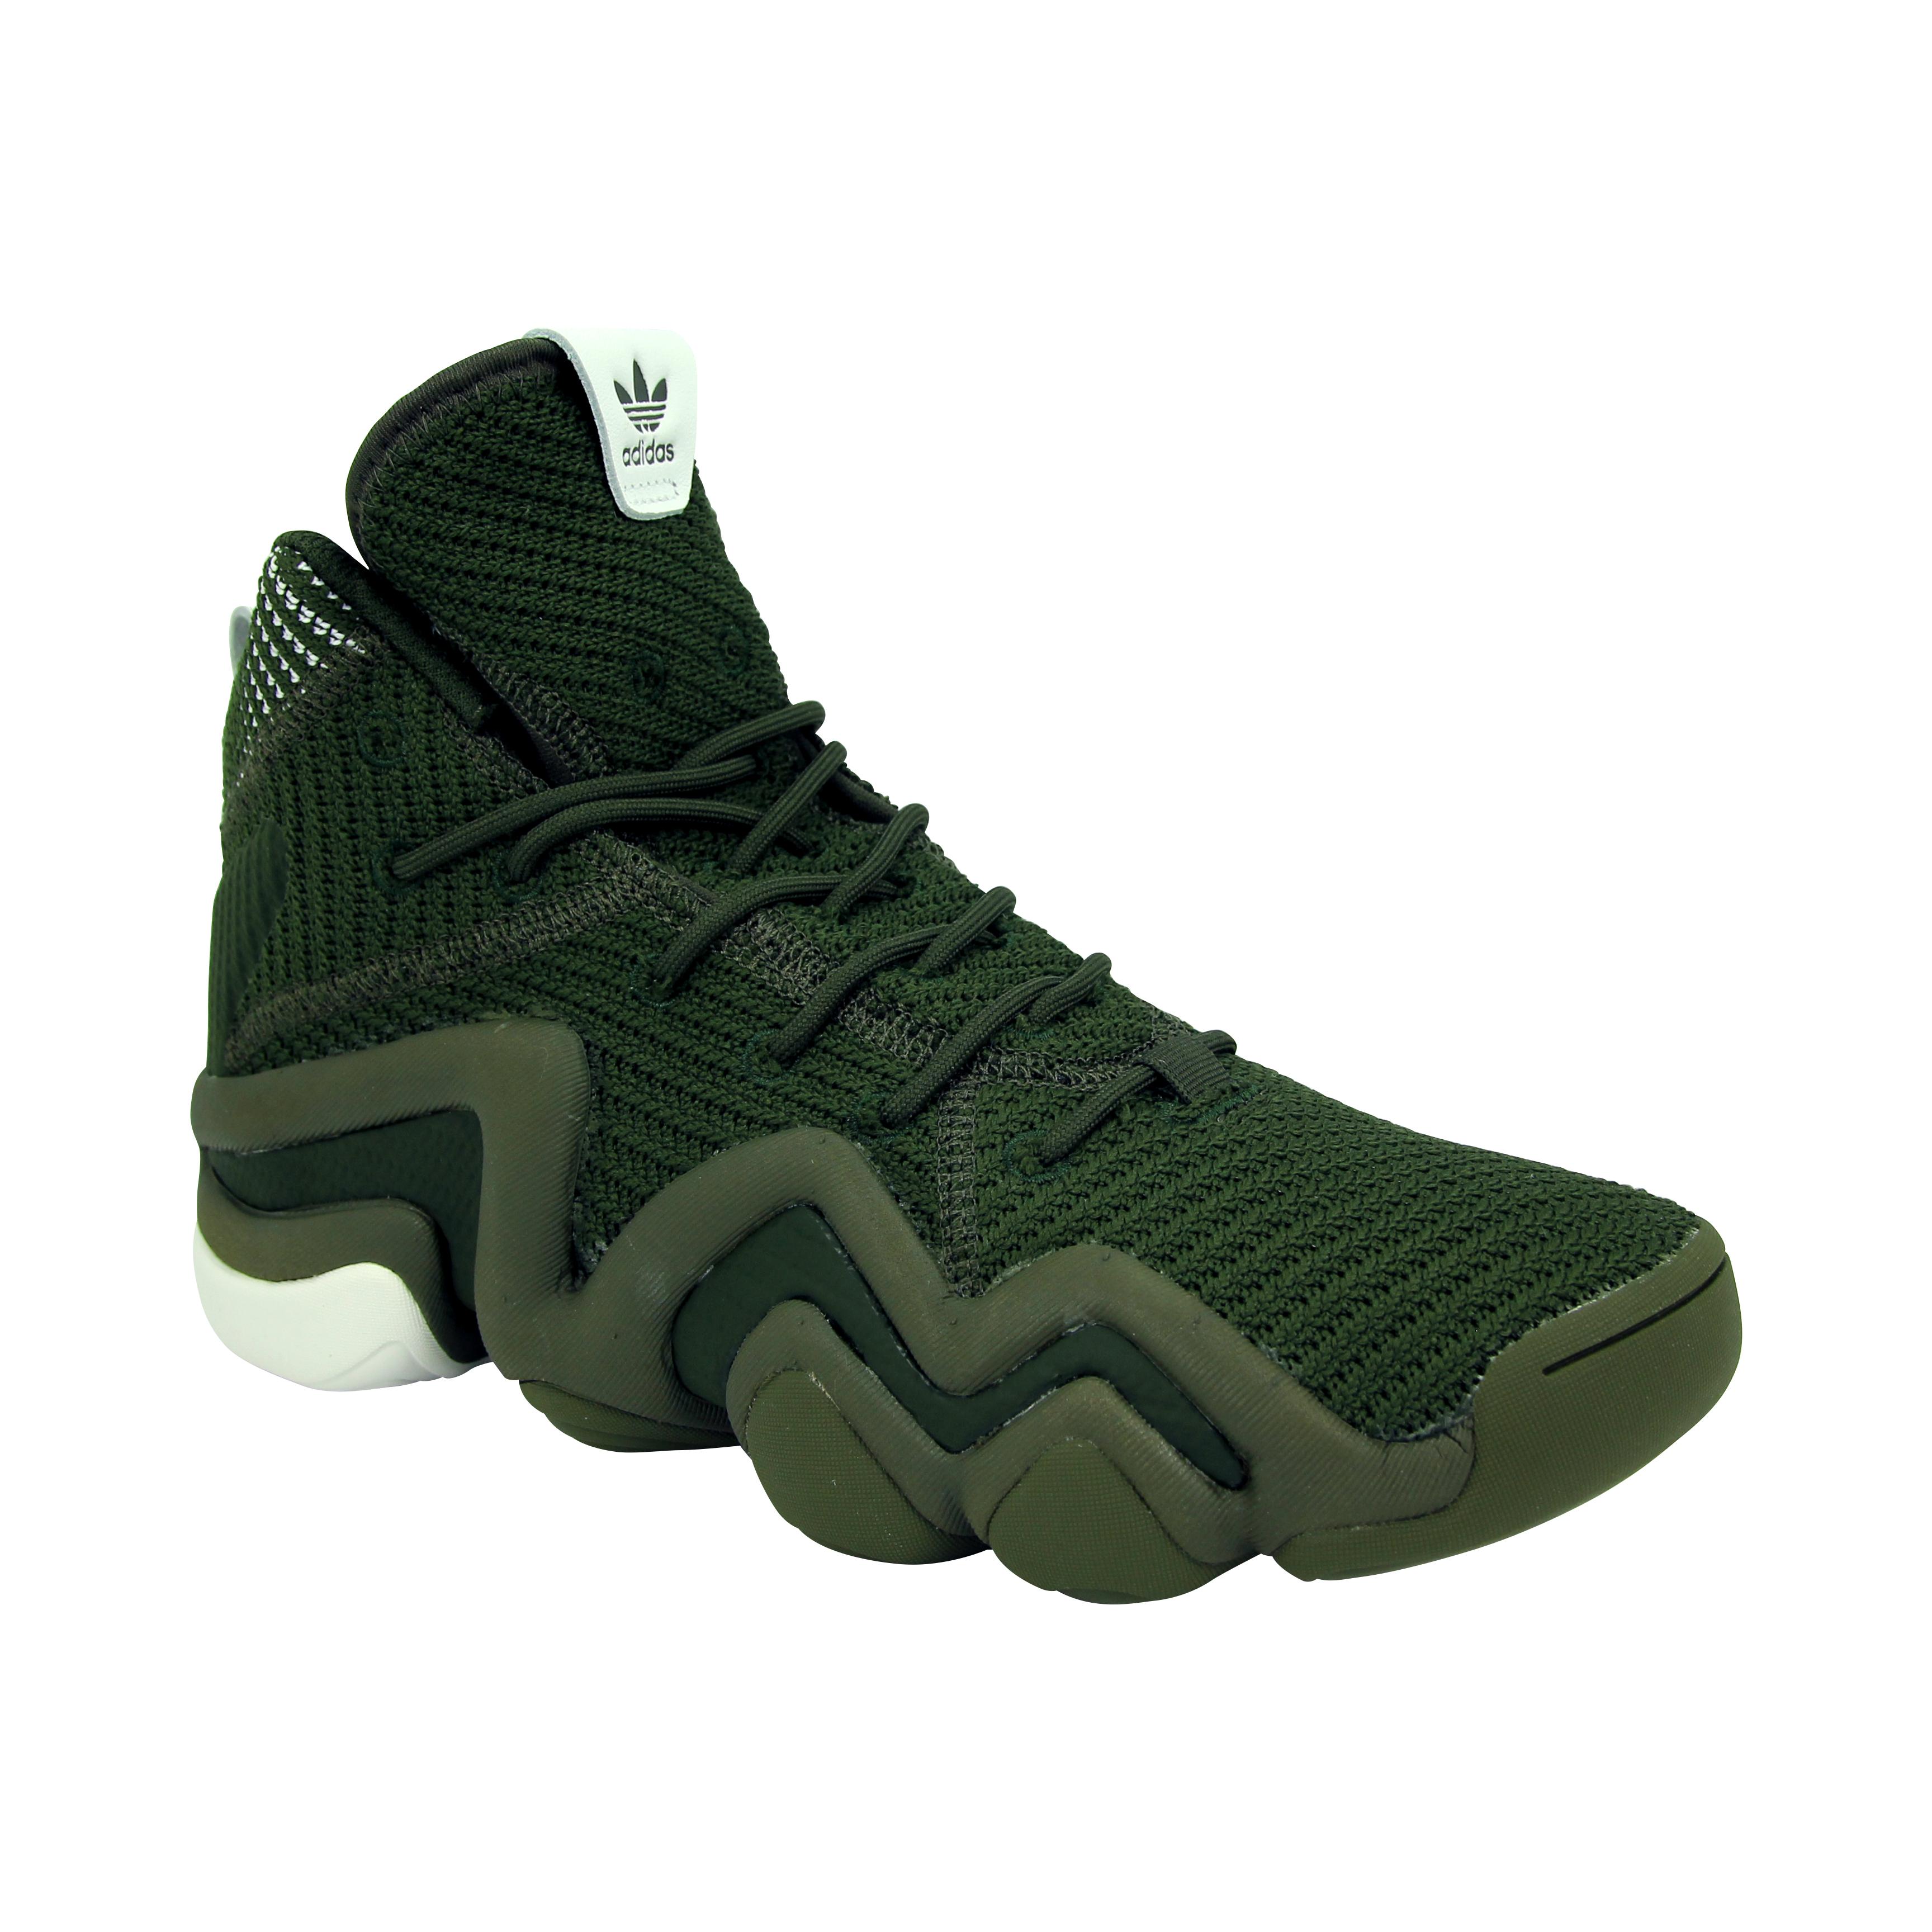 Originals Crazy Mode 8 Homme Sneakers Adv Primeknit Chaussures Adidas xgfHzwdx